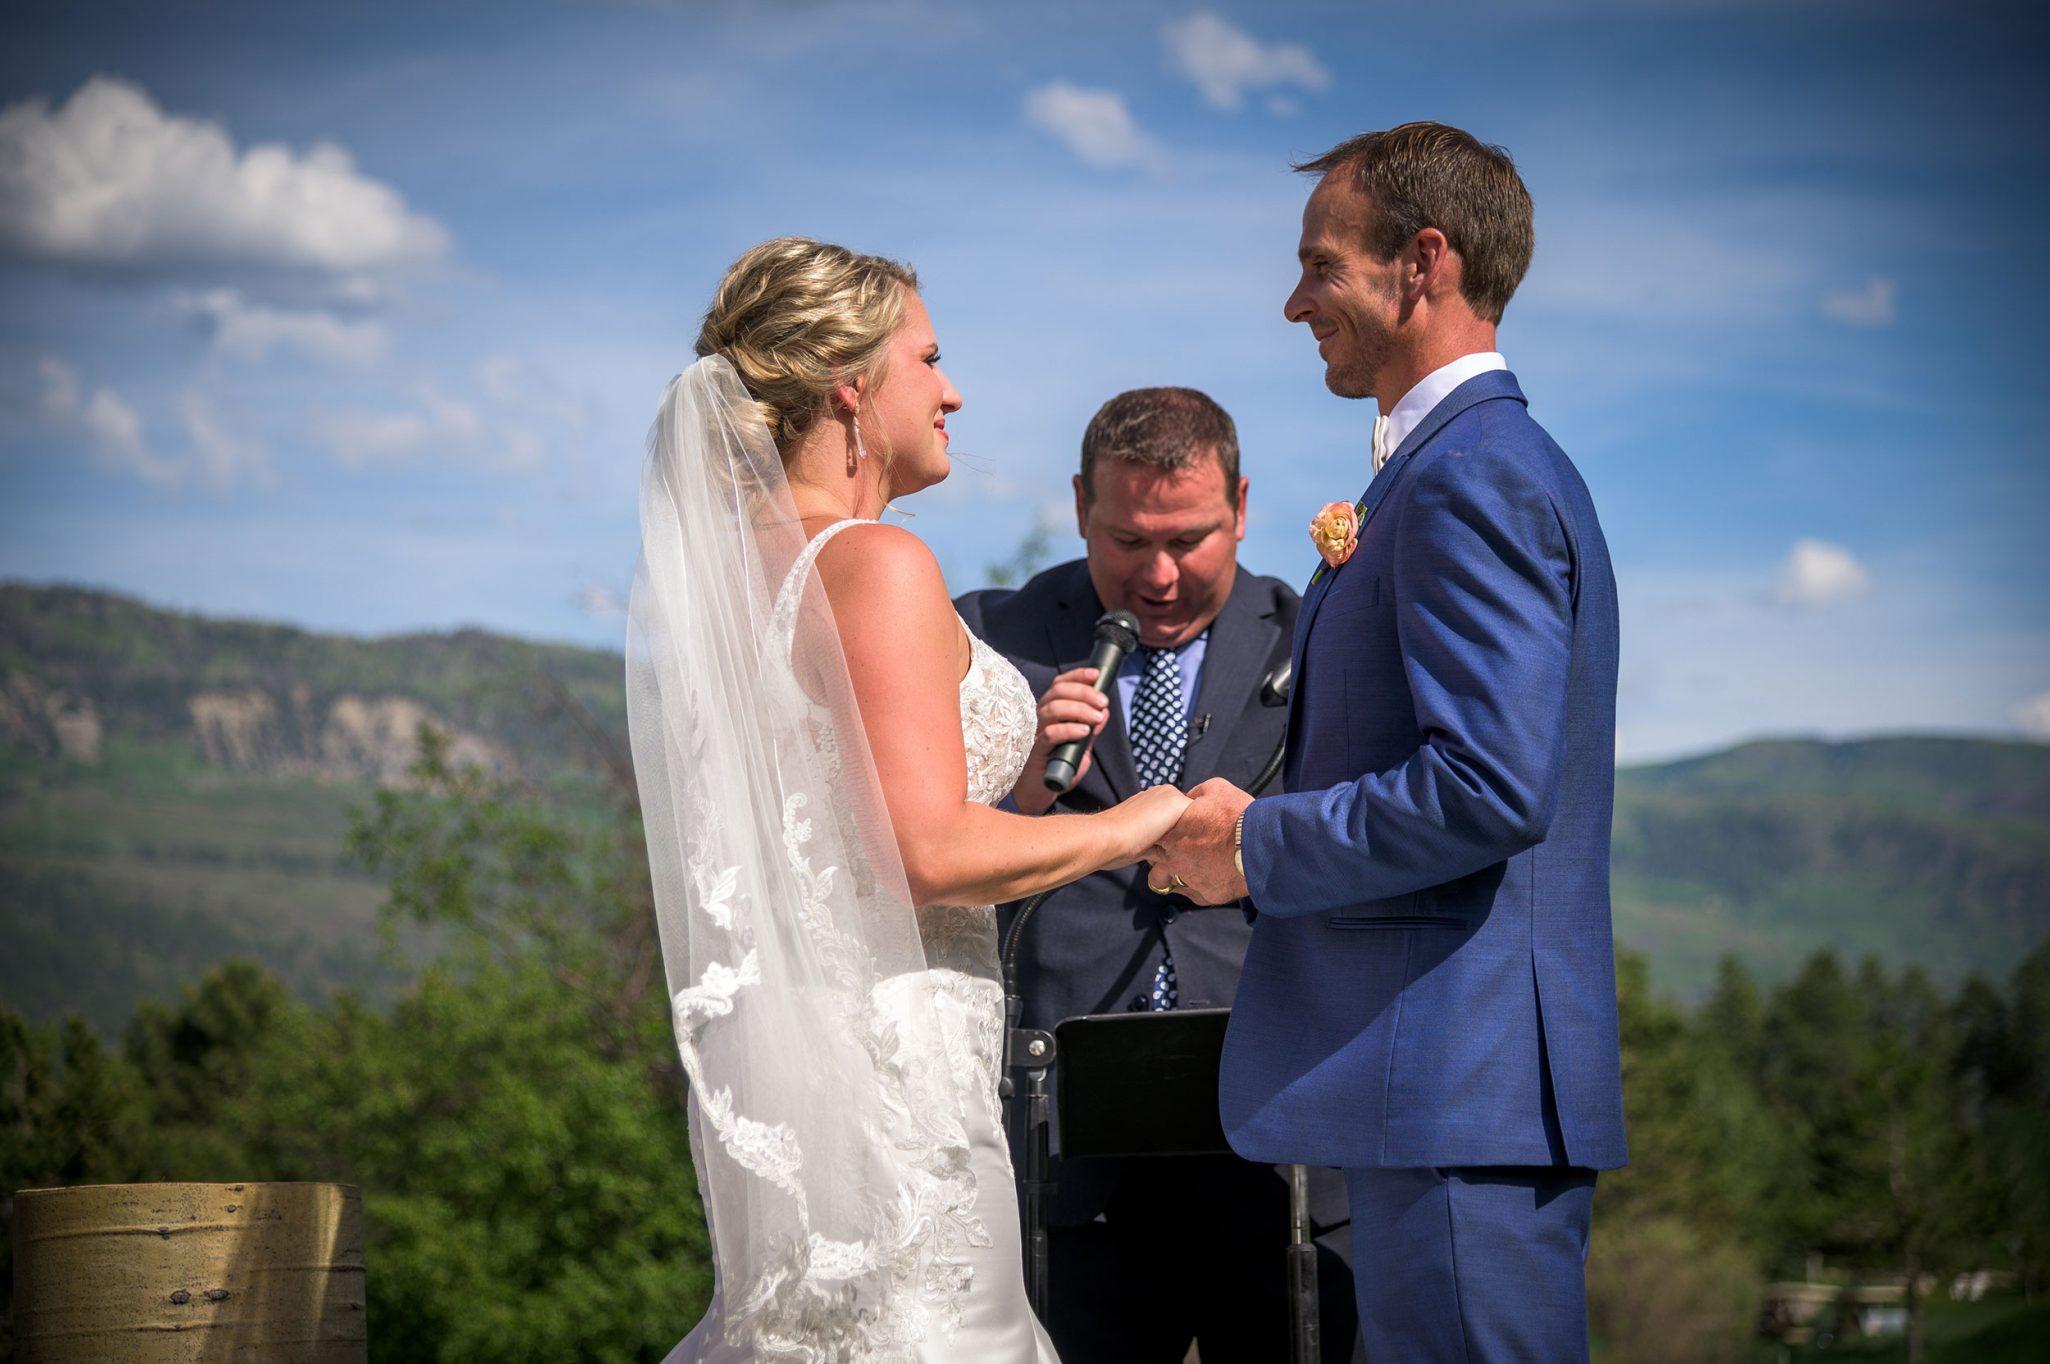 Mountain wedding ceremony | Durango Weddings Magazine